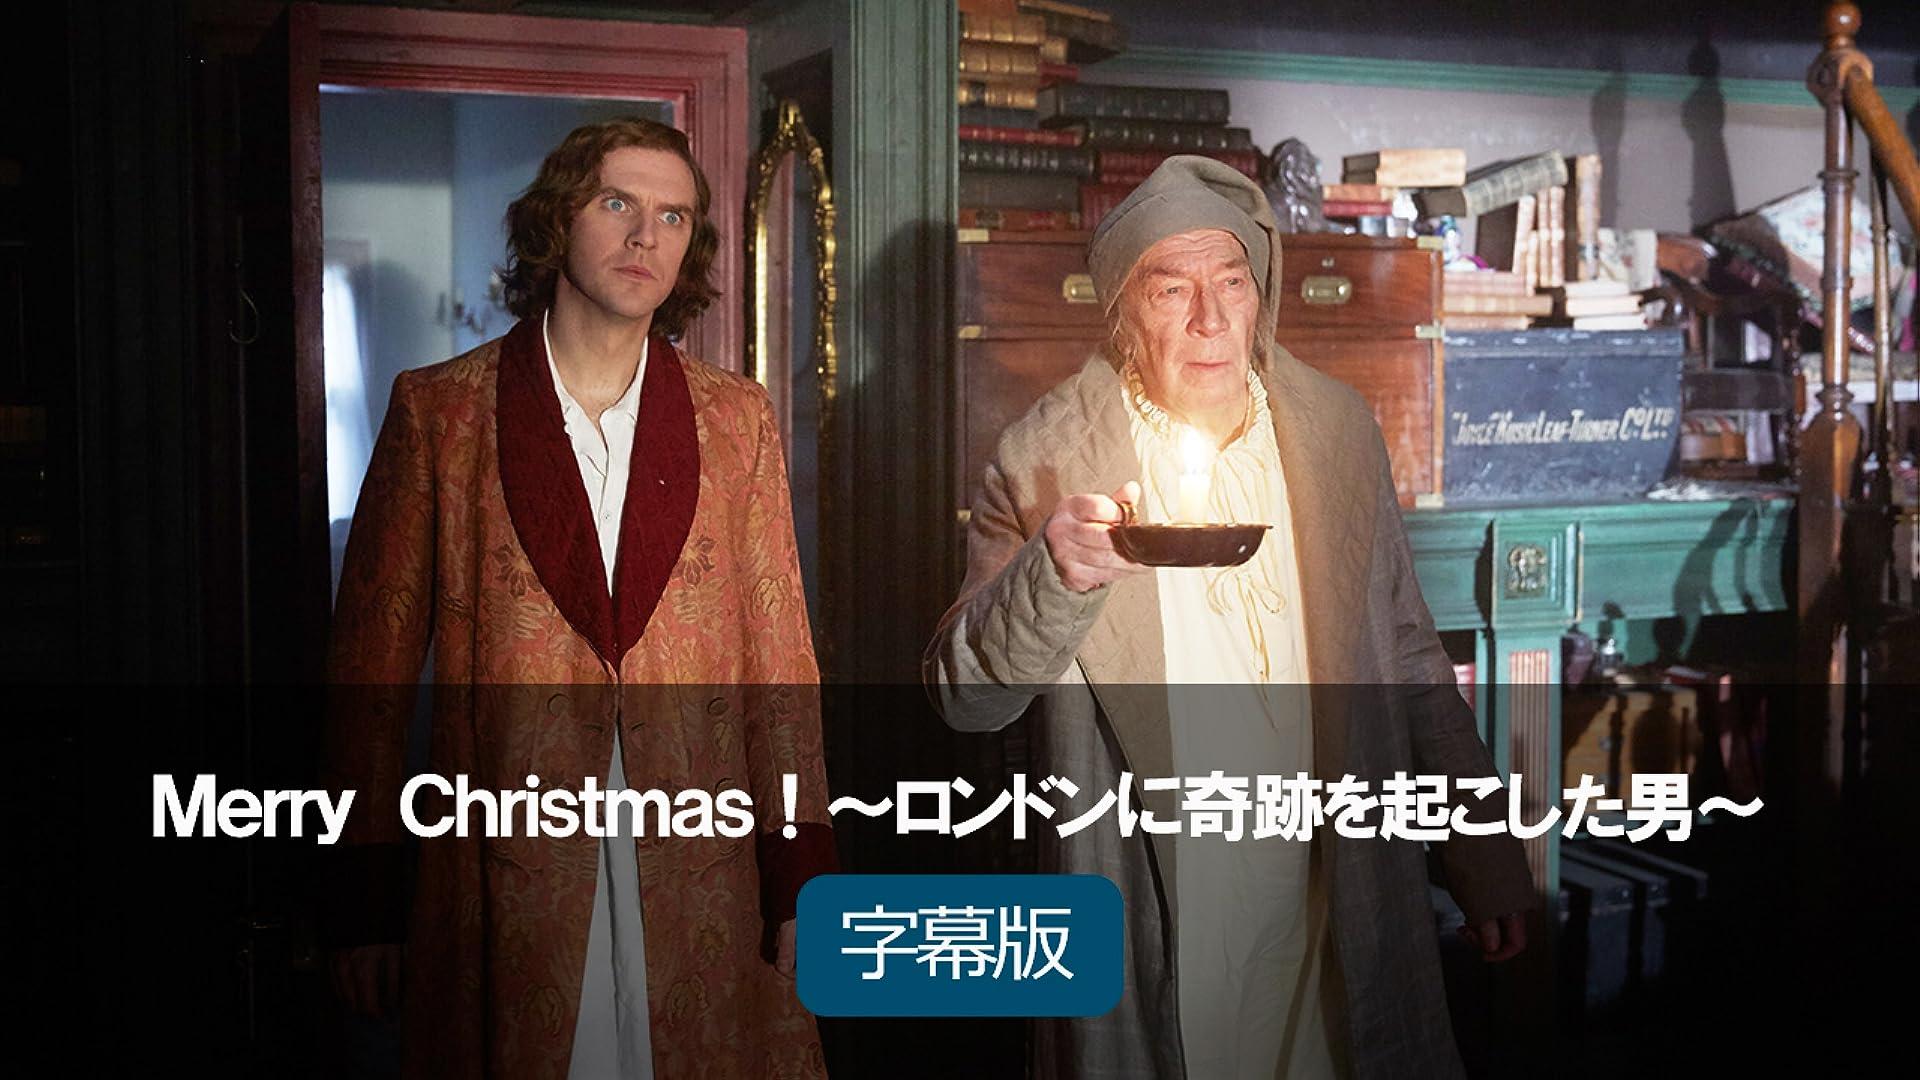 Merry Christmas!~ロンドンに奇跡を起こした男~(字幕版)